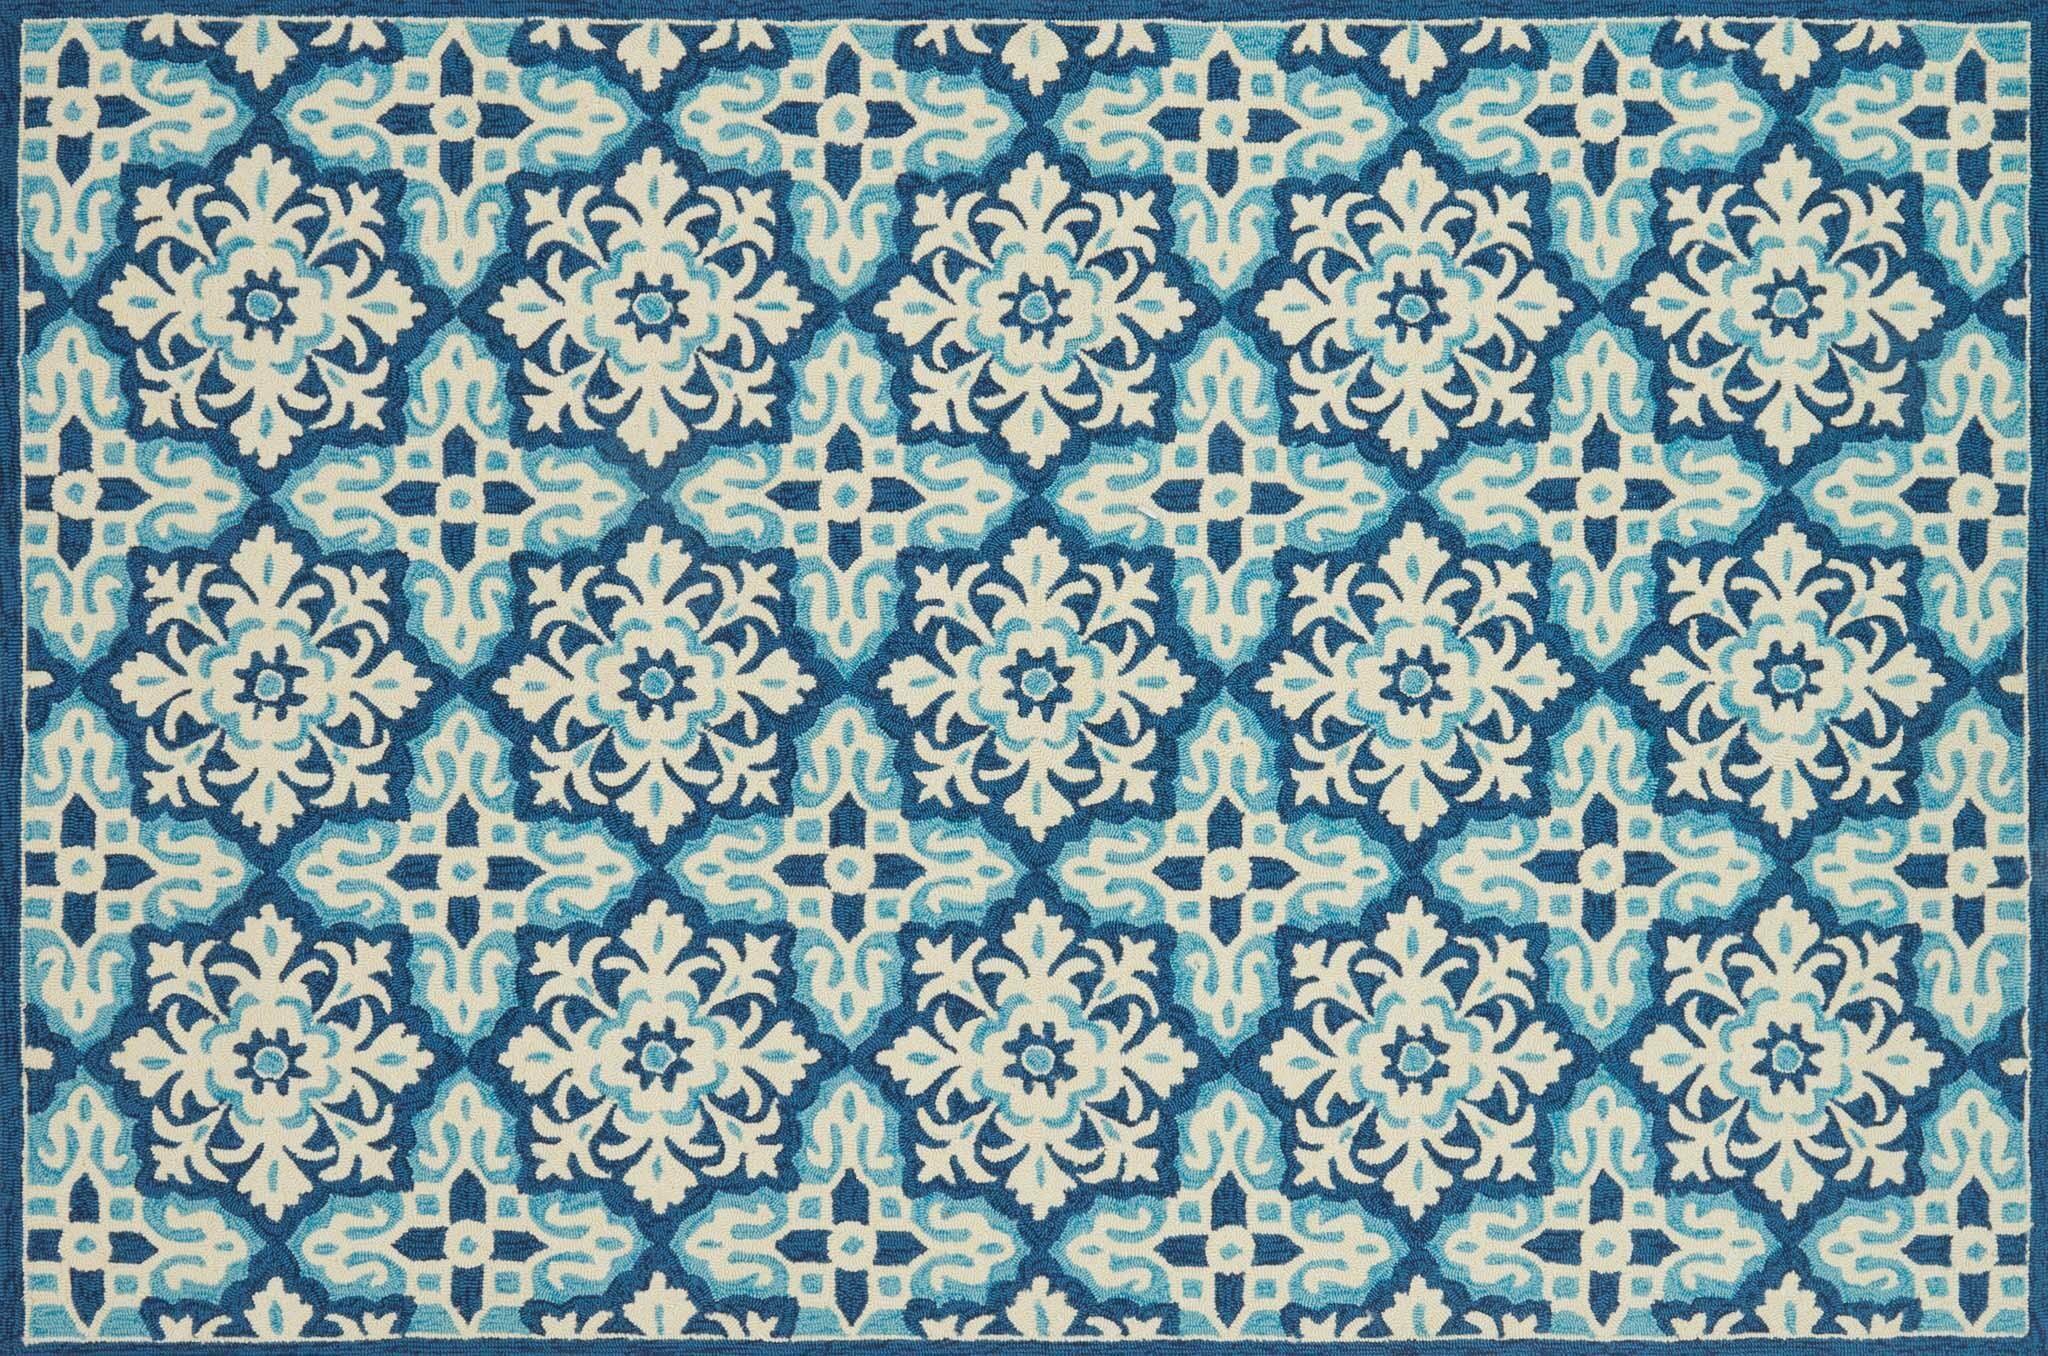 Duvig Hand-Hooked Ivory/Blue Area Rug Rug Size: Rectangle 7'6